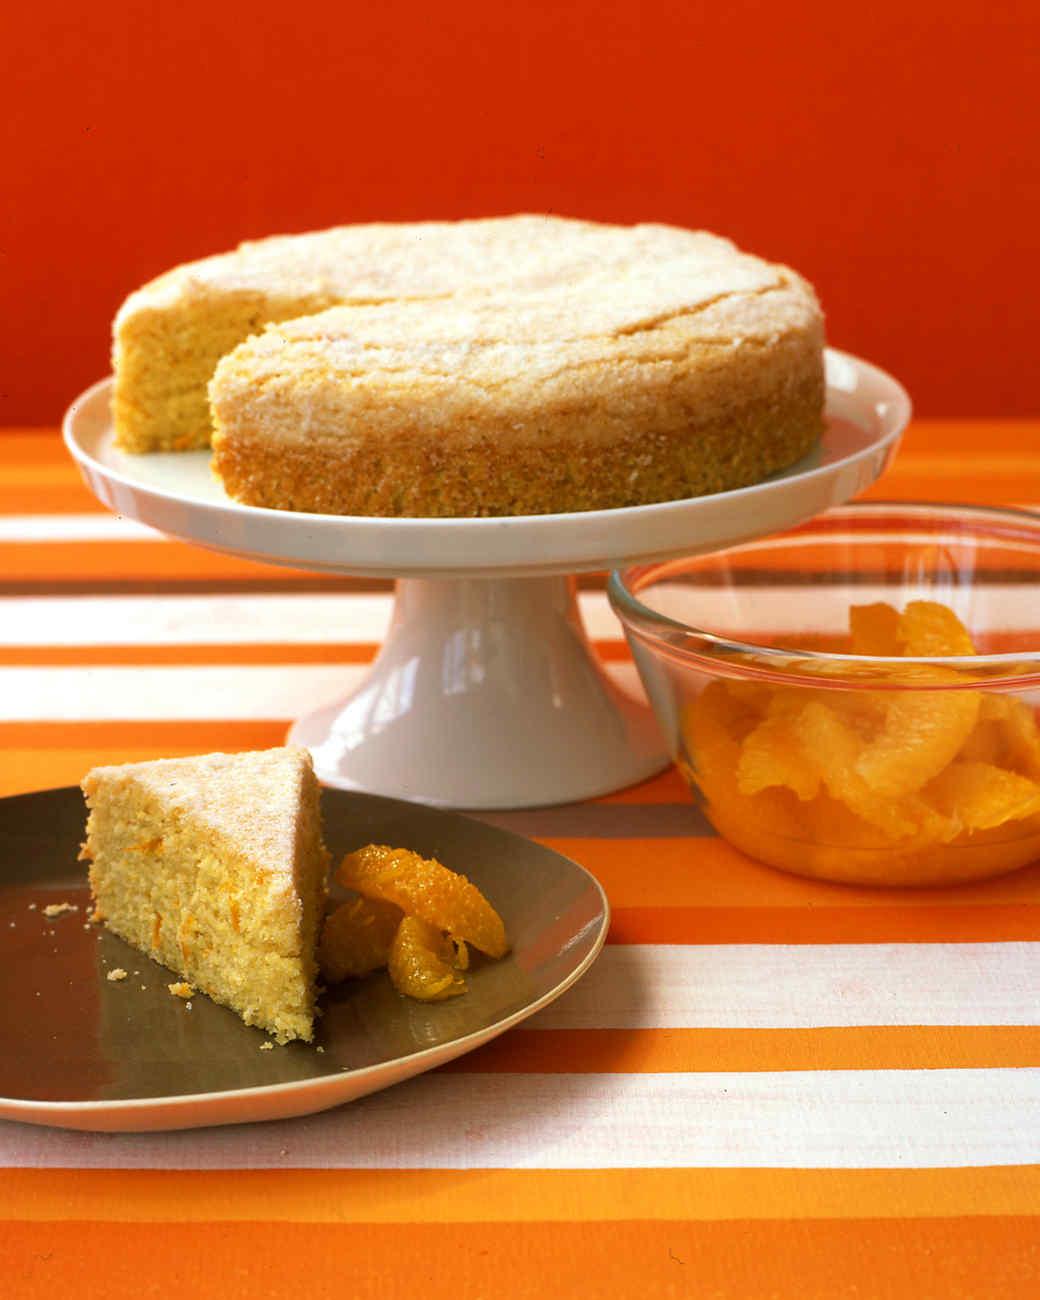 1004_edf_orangecake.jpg